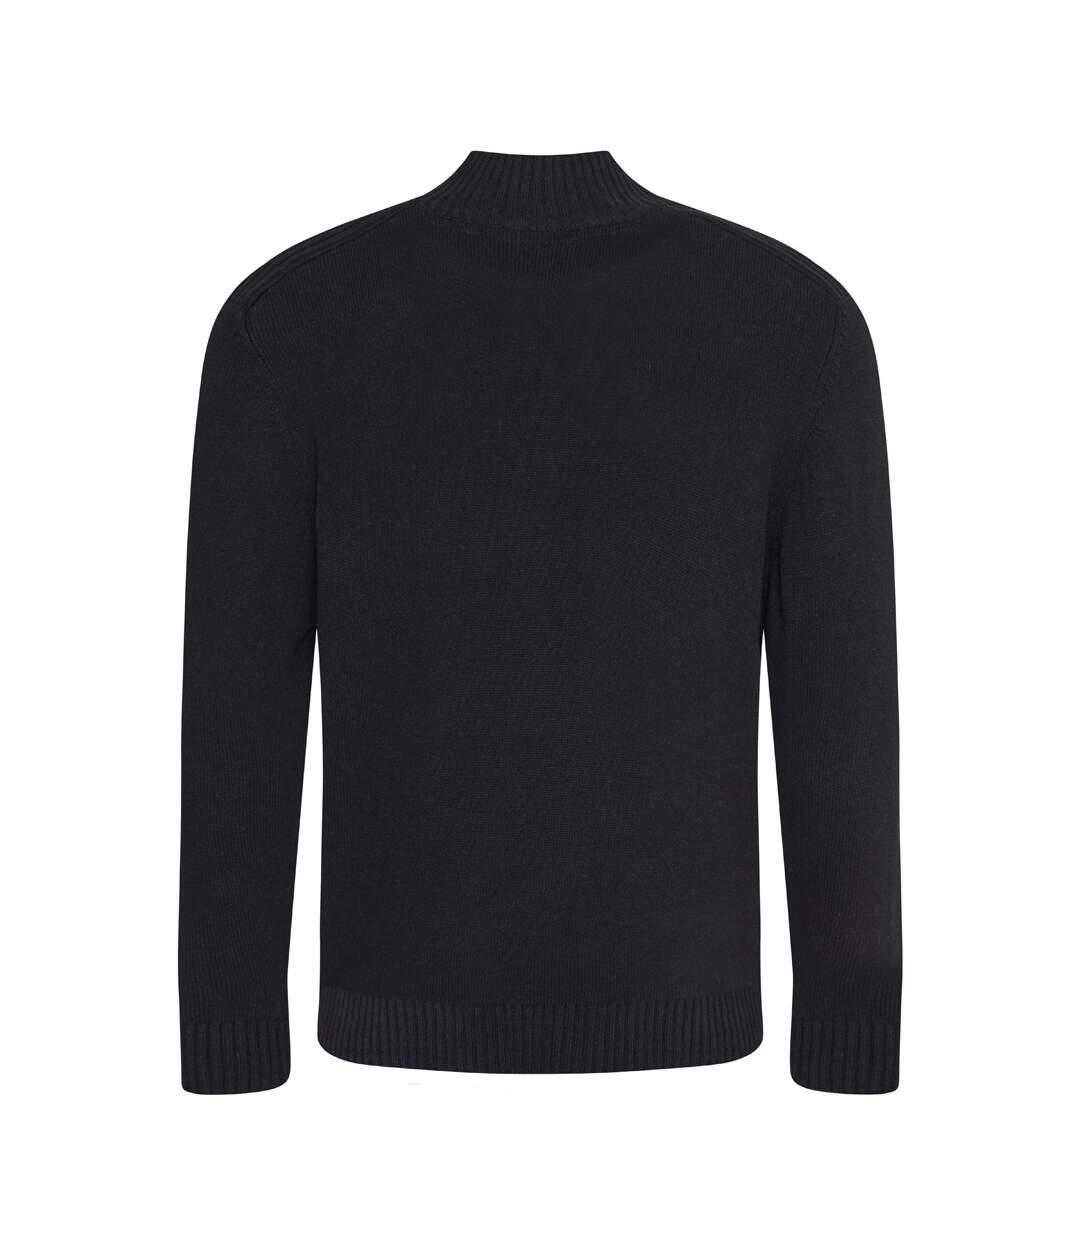 Ecologie Mens Wakhan Zip Neck Sweater (Black) - UTPC3065